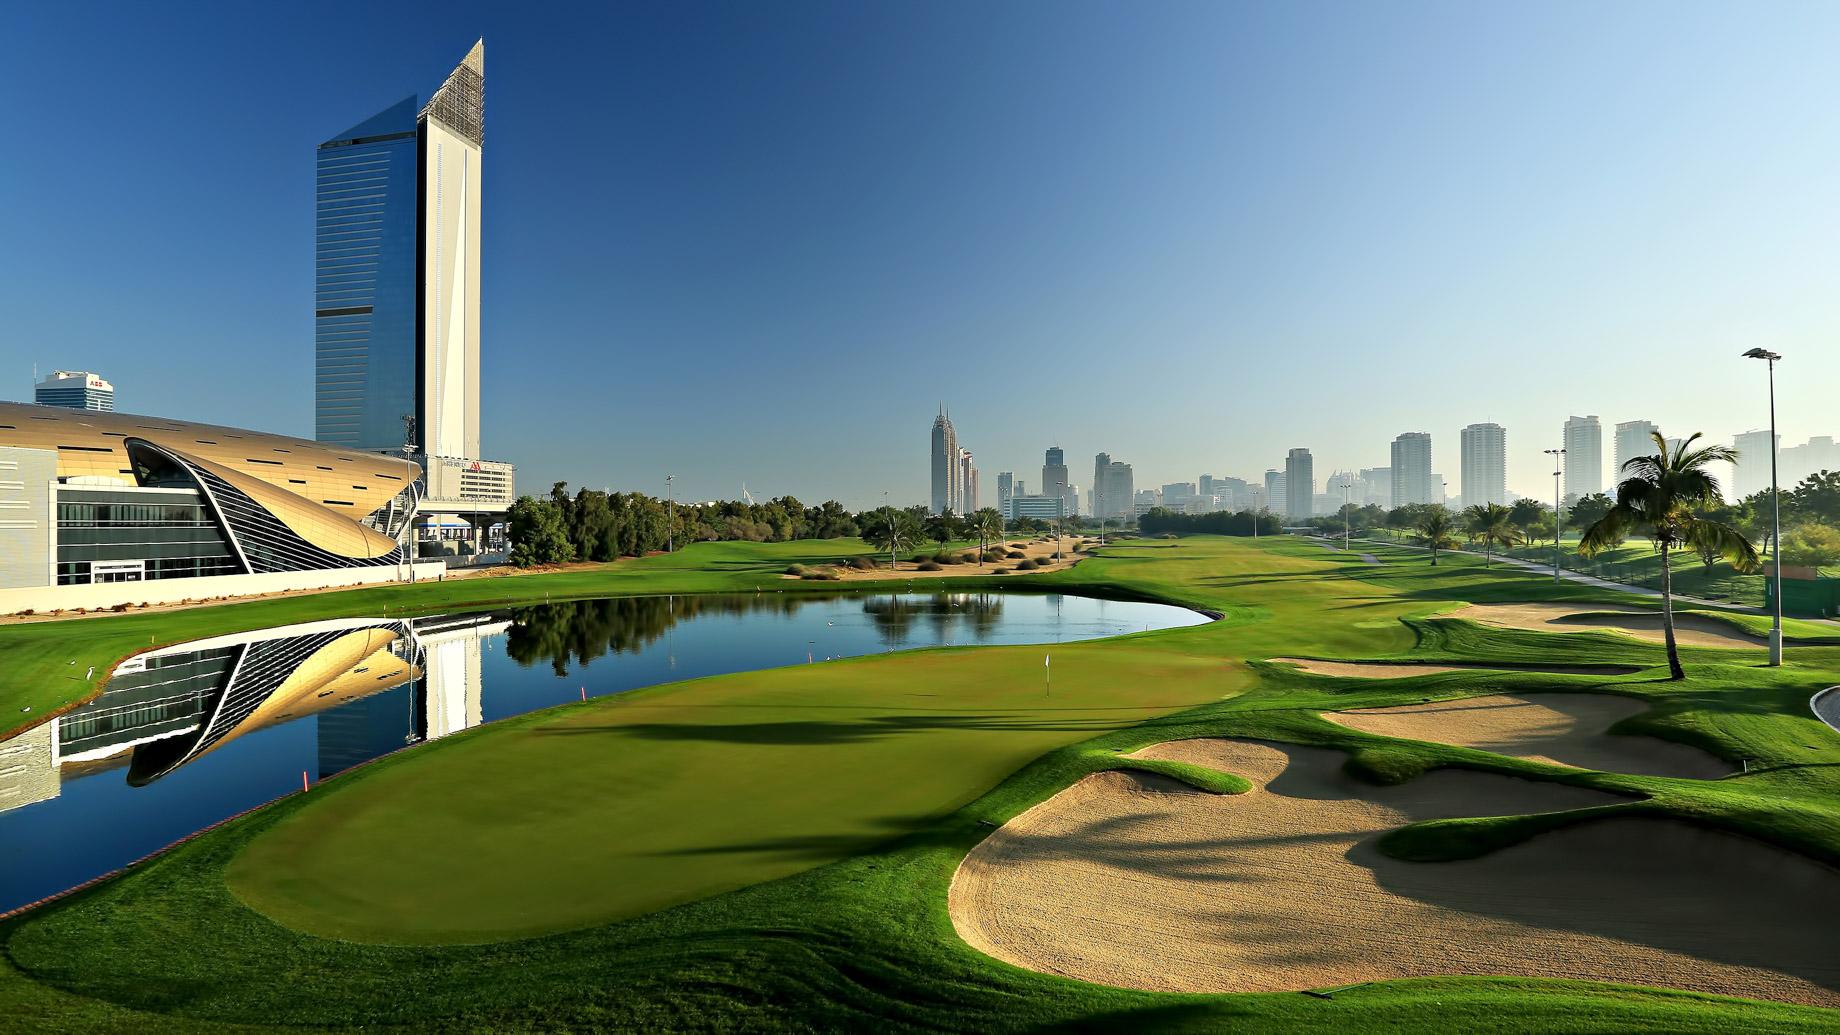 The Views Development - Dubai, United Arab Emirates